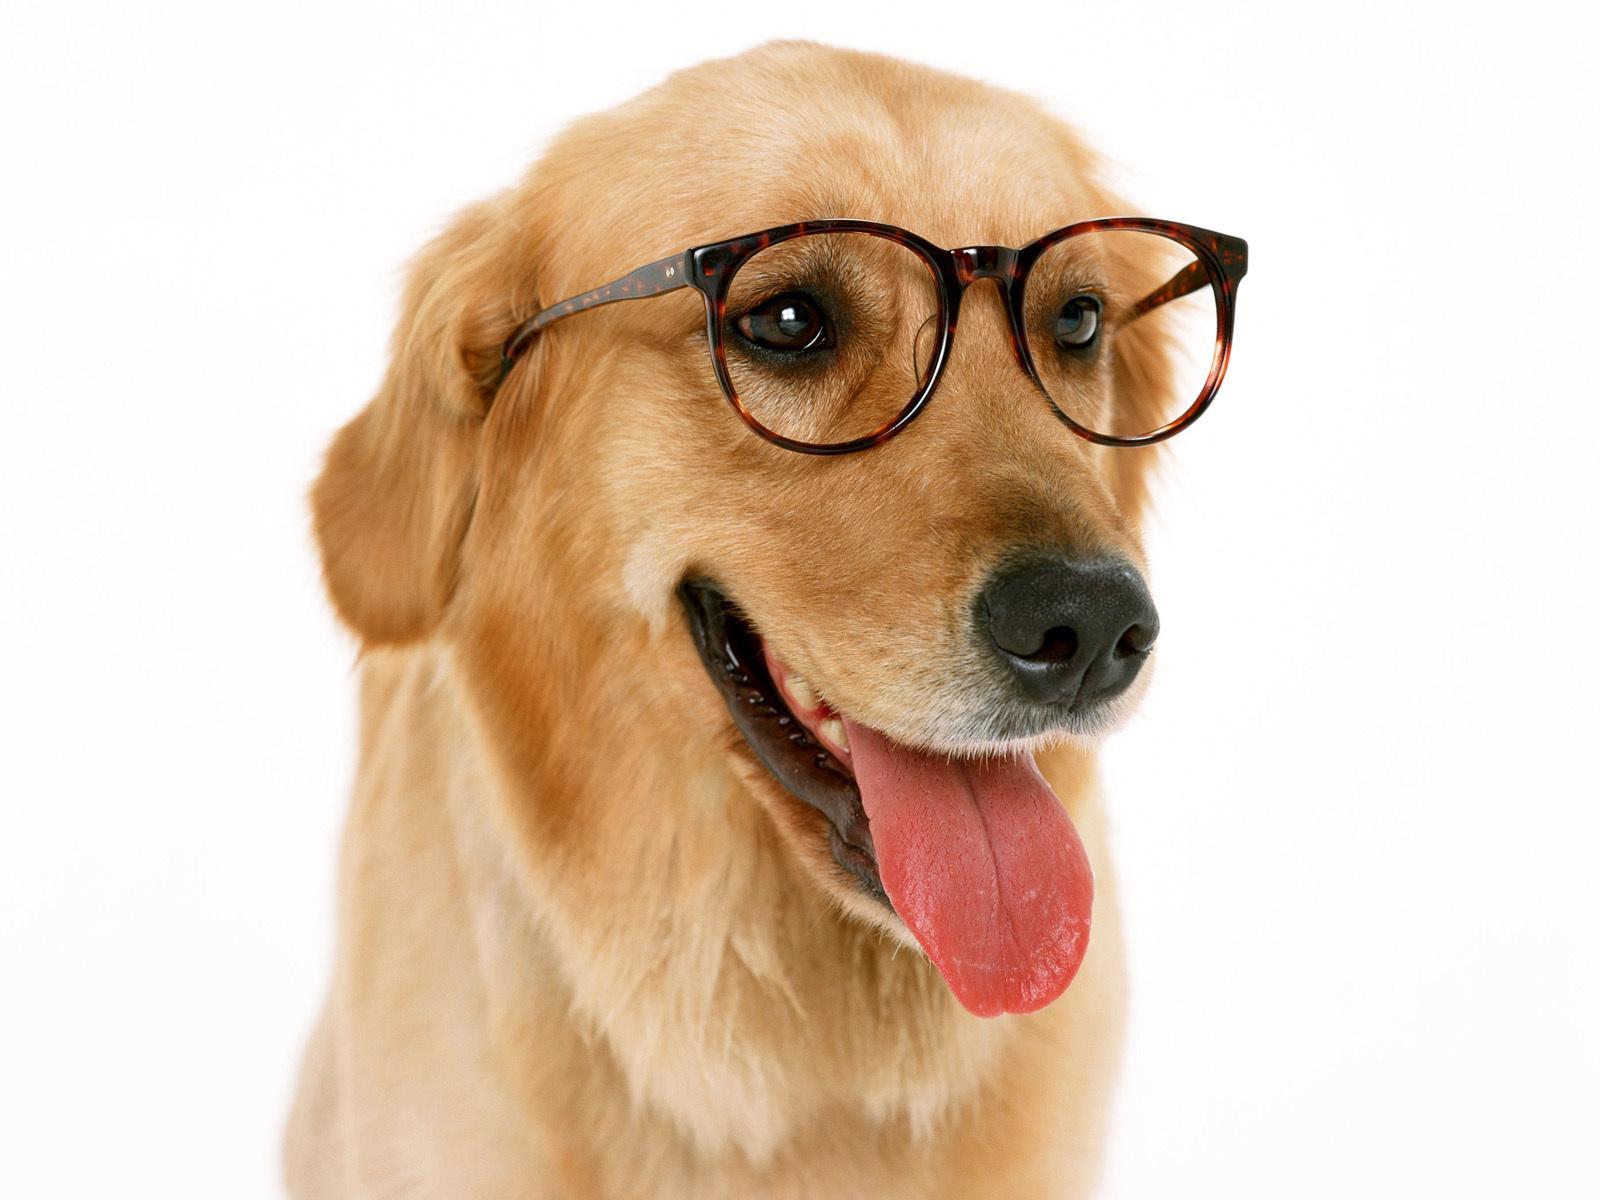 Dogs fun dog wallpaper